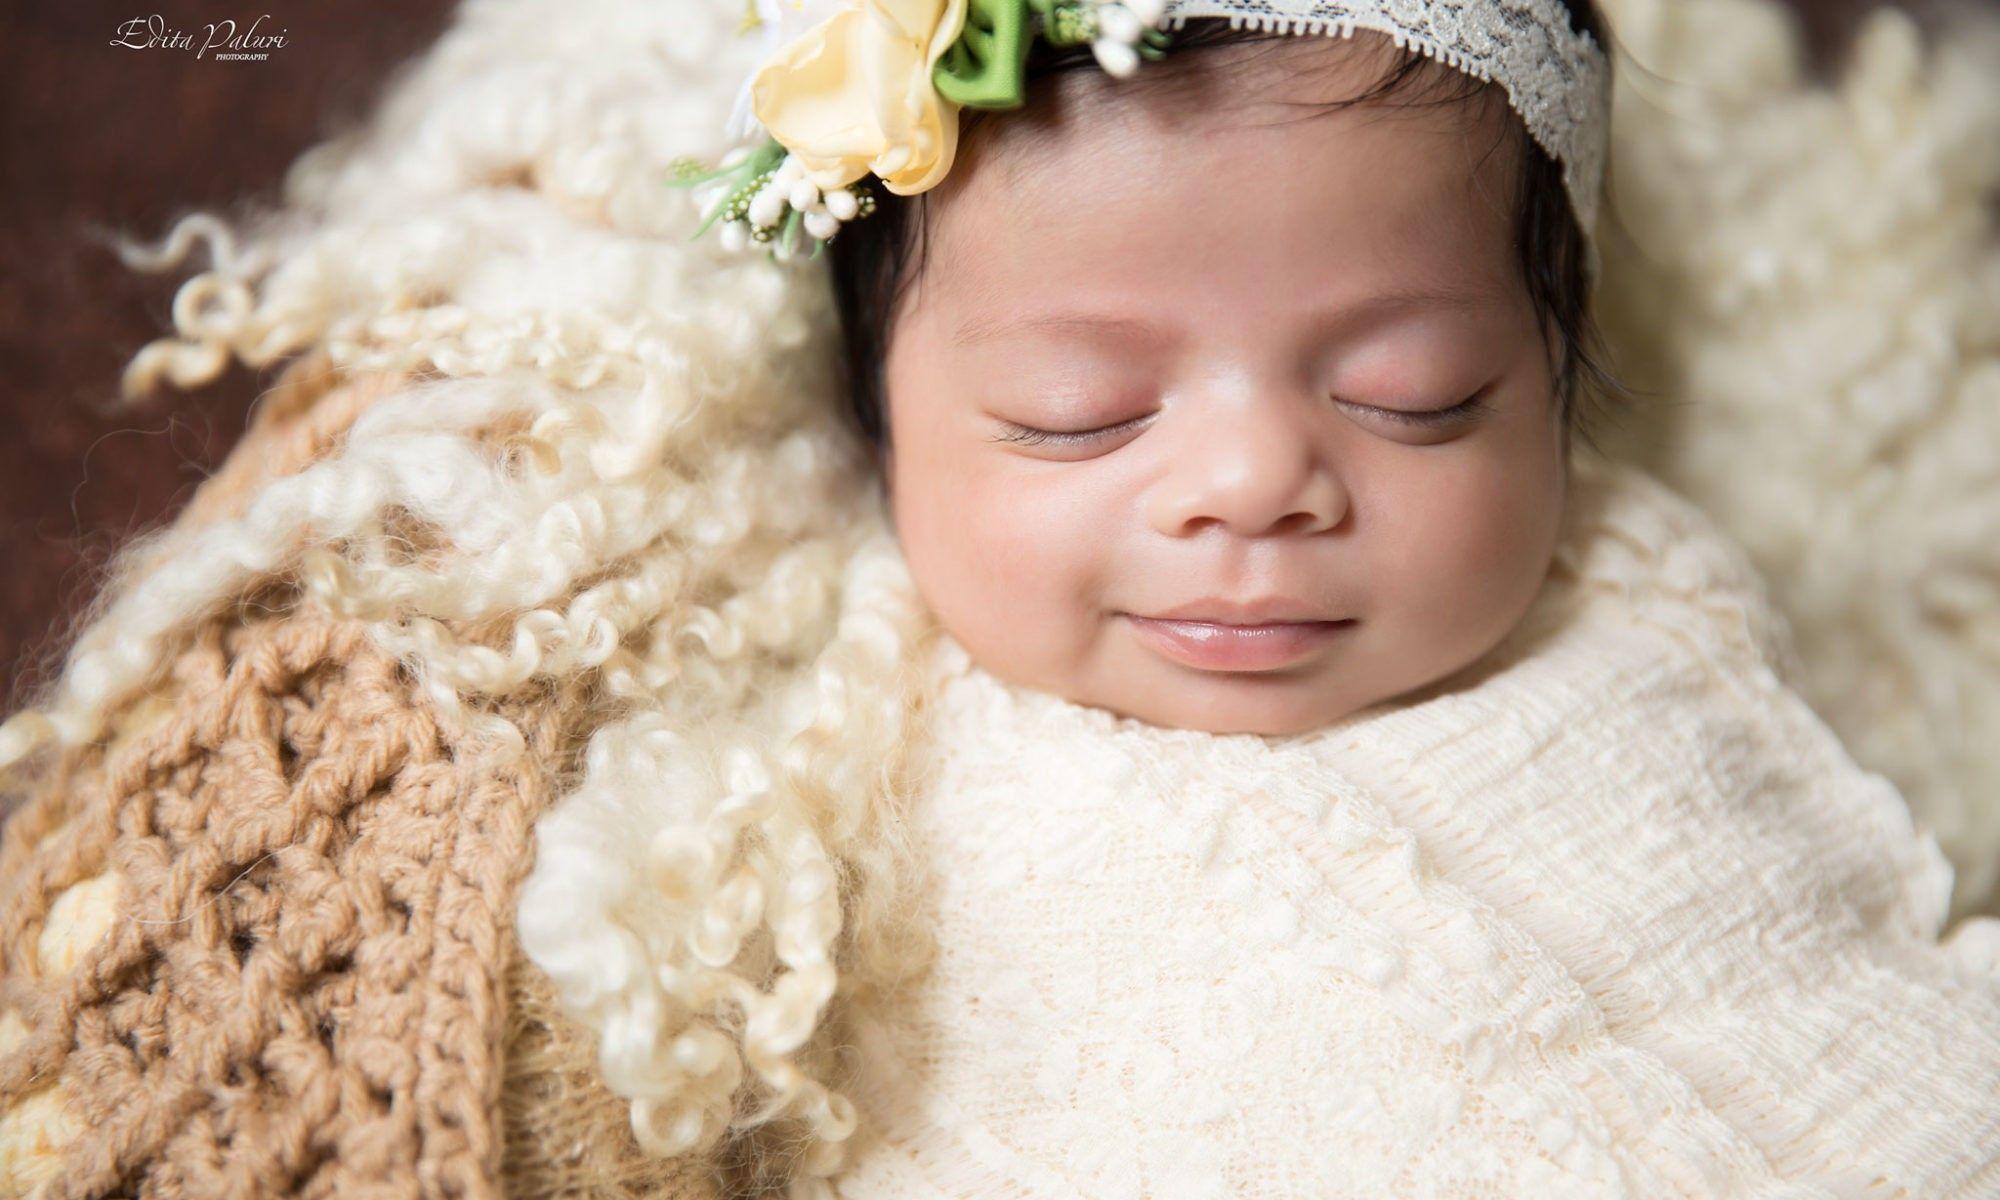 Baby girl newborn baby girl photography pune infants baby photos young